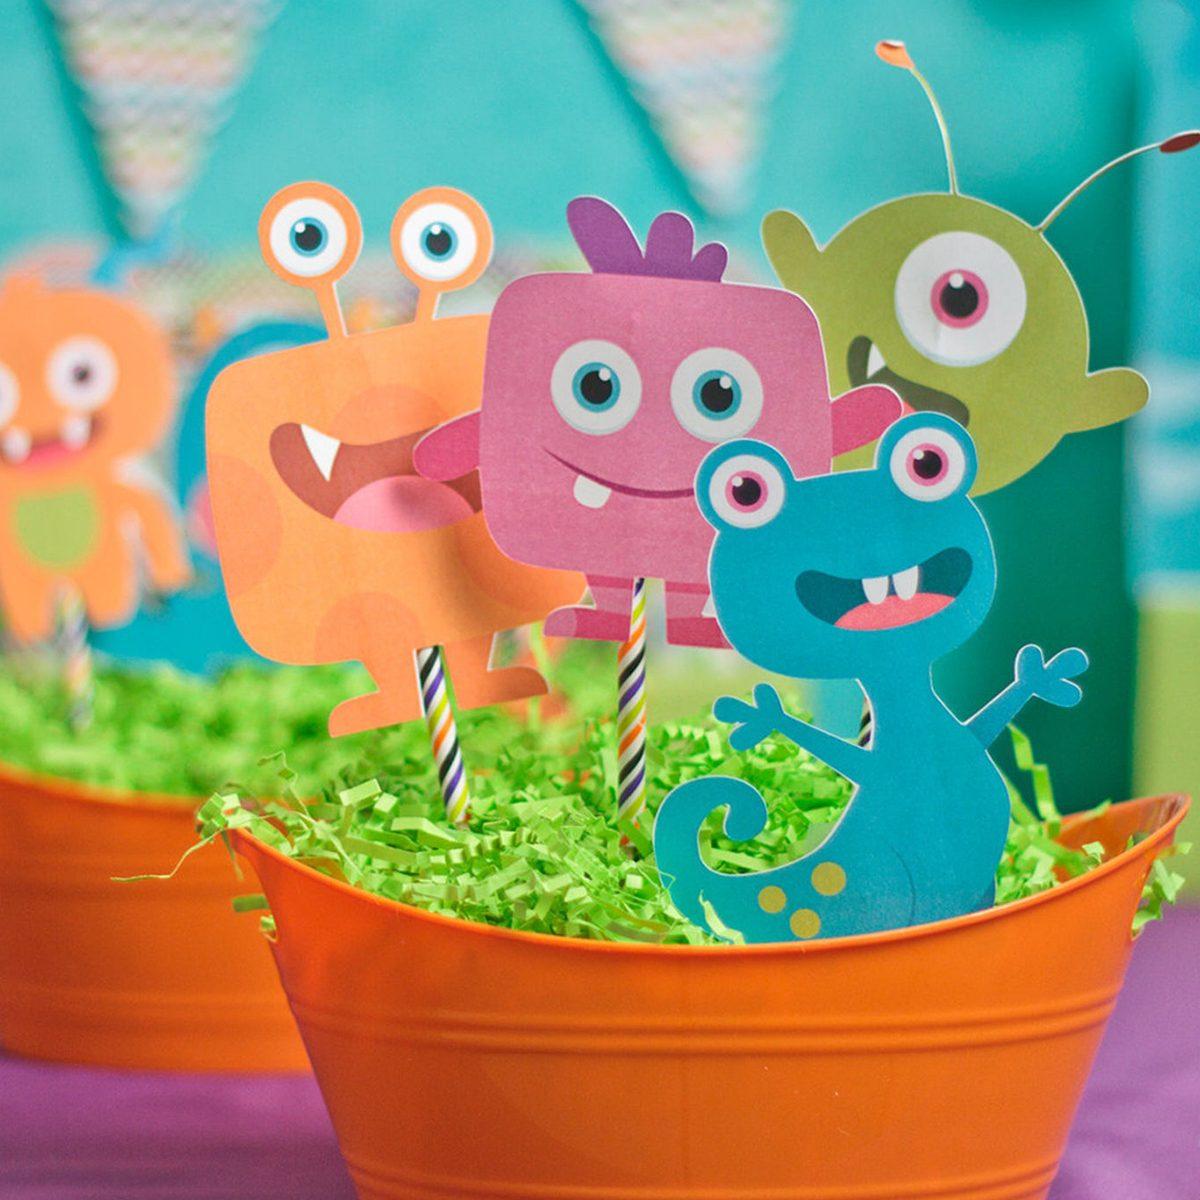 Little Monsters; Little Monsters Party; Monster Birthday Party; Little Monstersl Birthday Party;Little Monster; Little Monsters Centerpieces